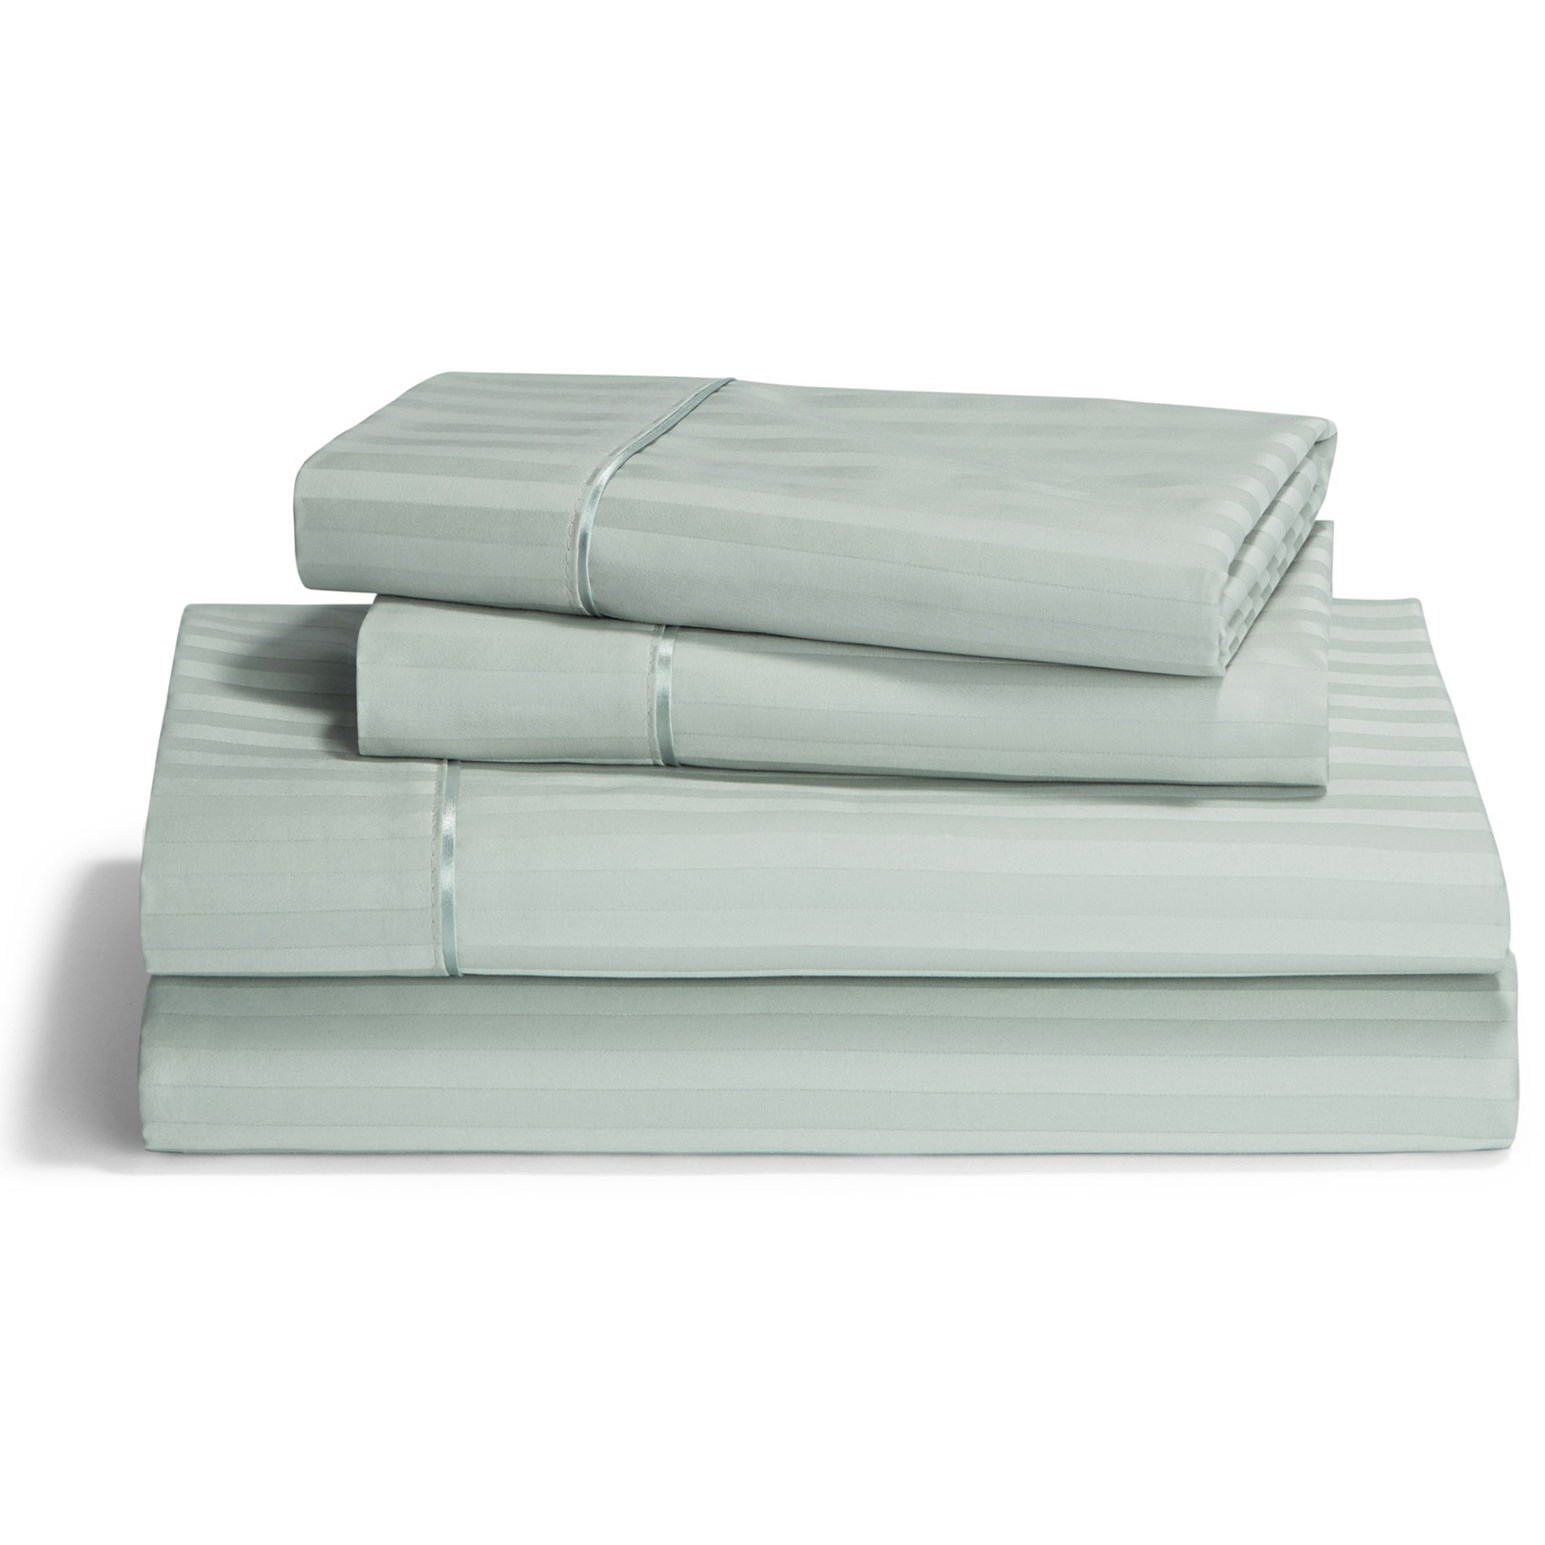 Egyptian Cotton Sheet Sets King Pale Green Egyptian Cotton Sheet Set at Johnny Janosik